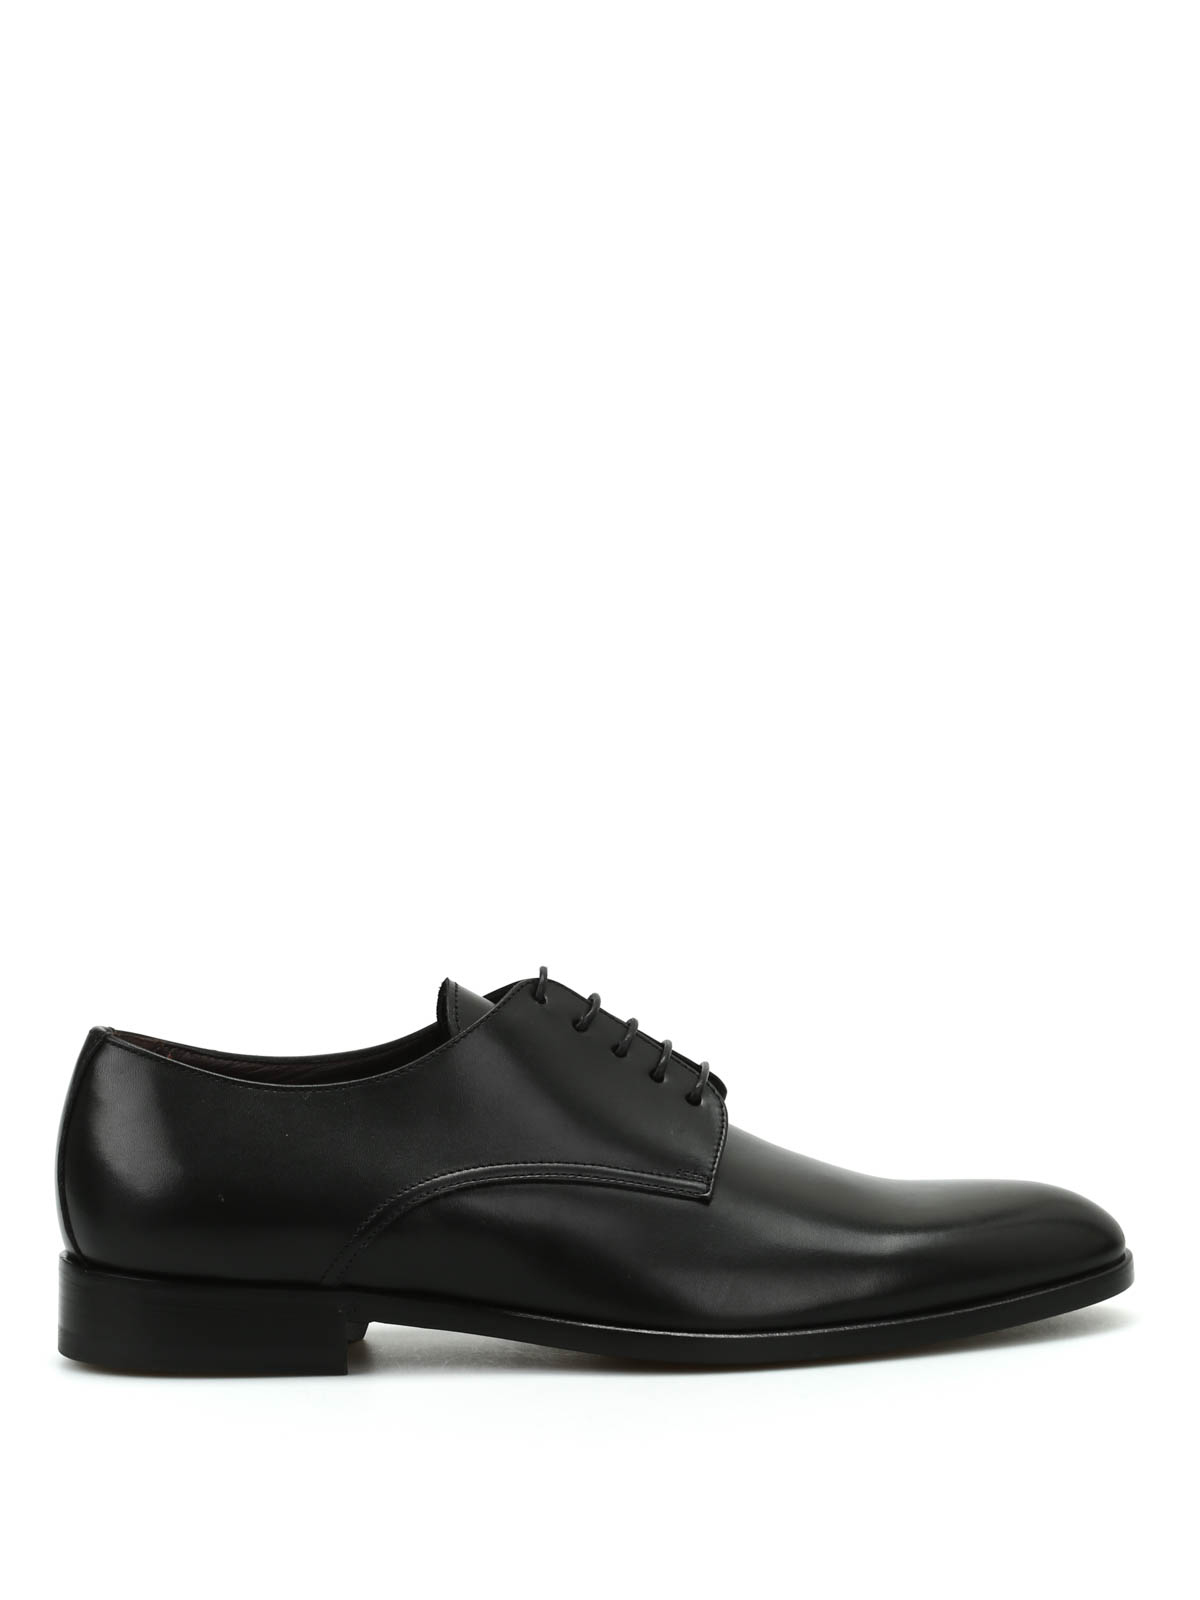 derby classic shoes by ermenegildo zegna classic shoes